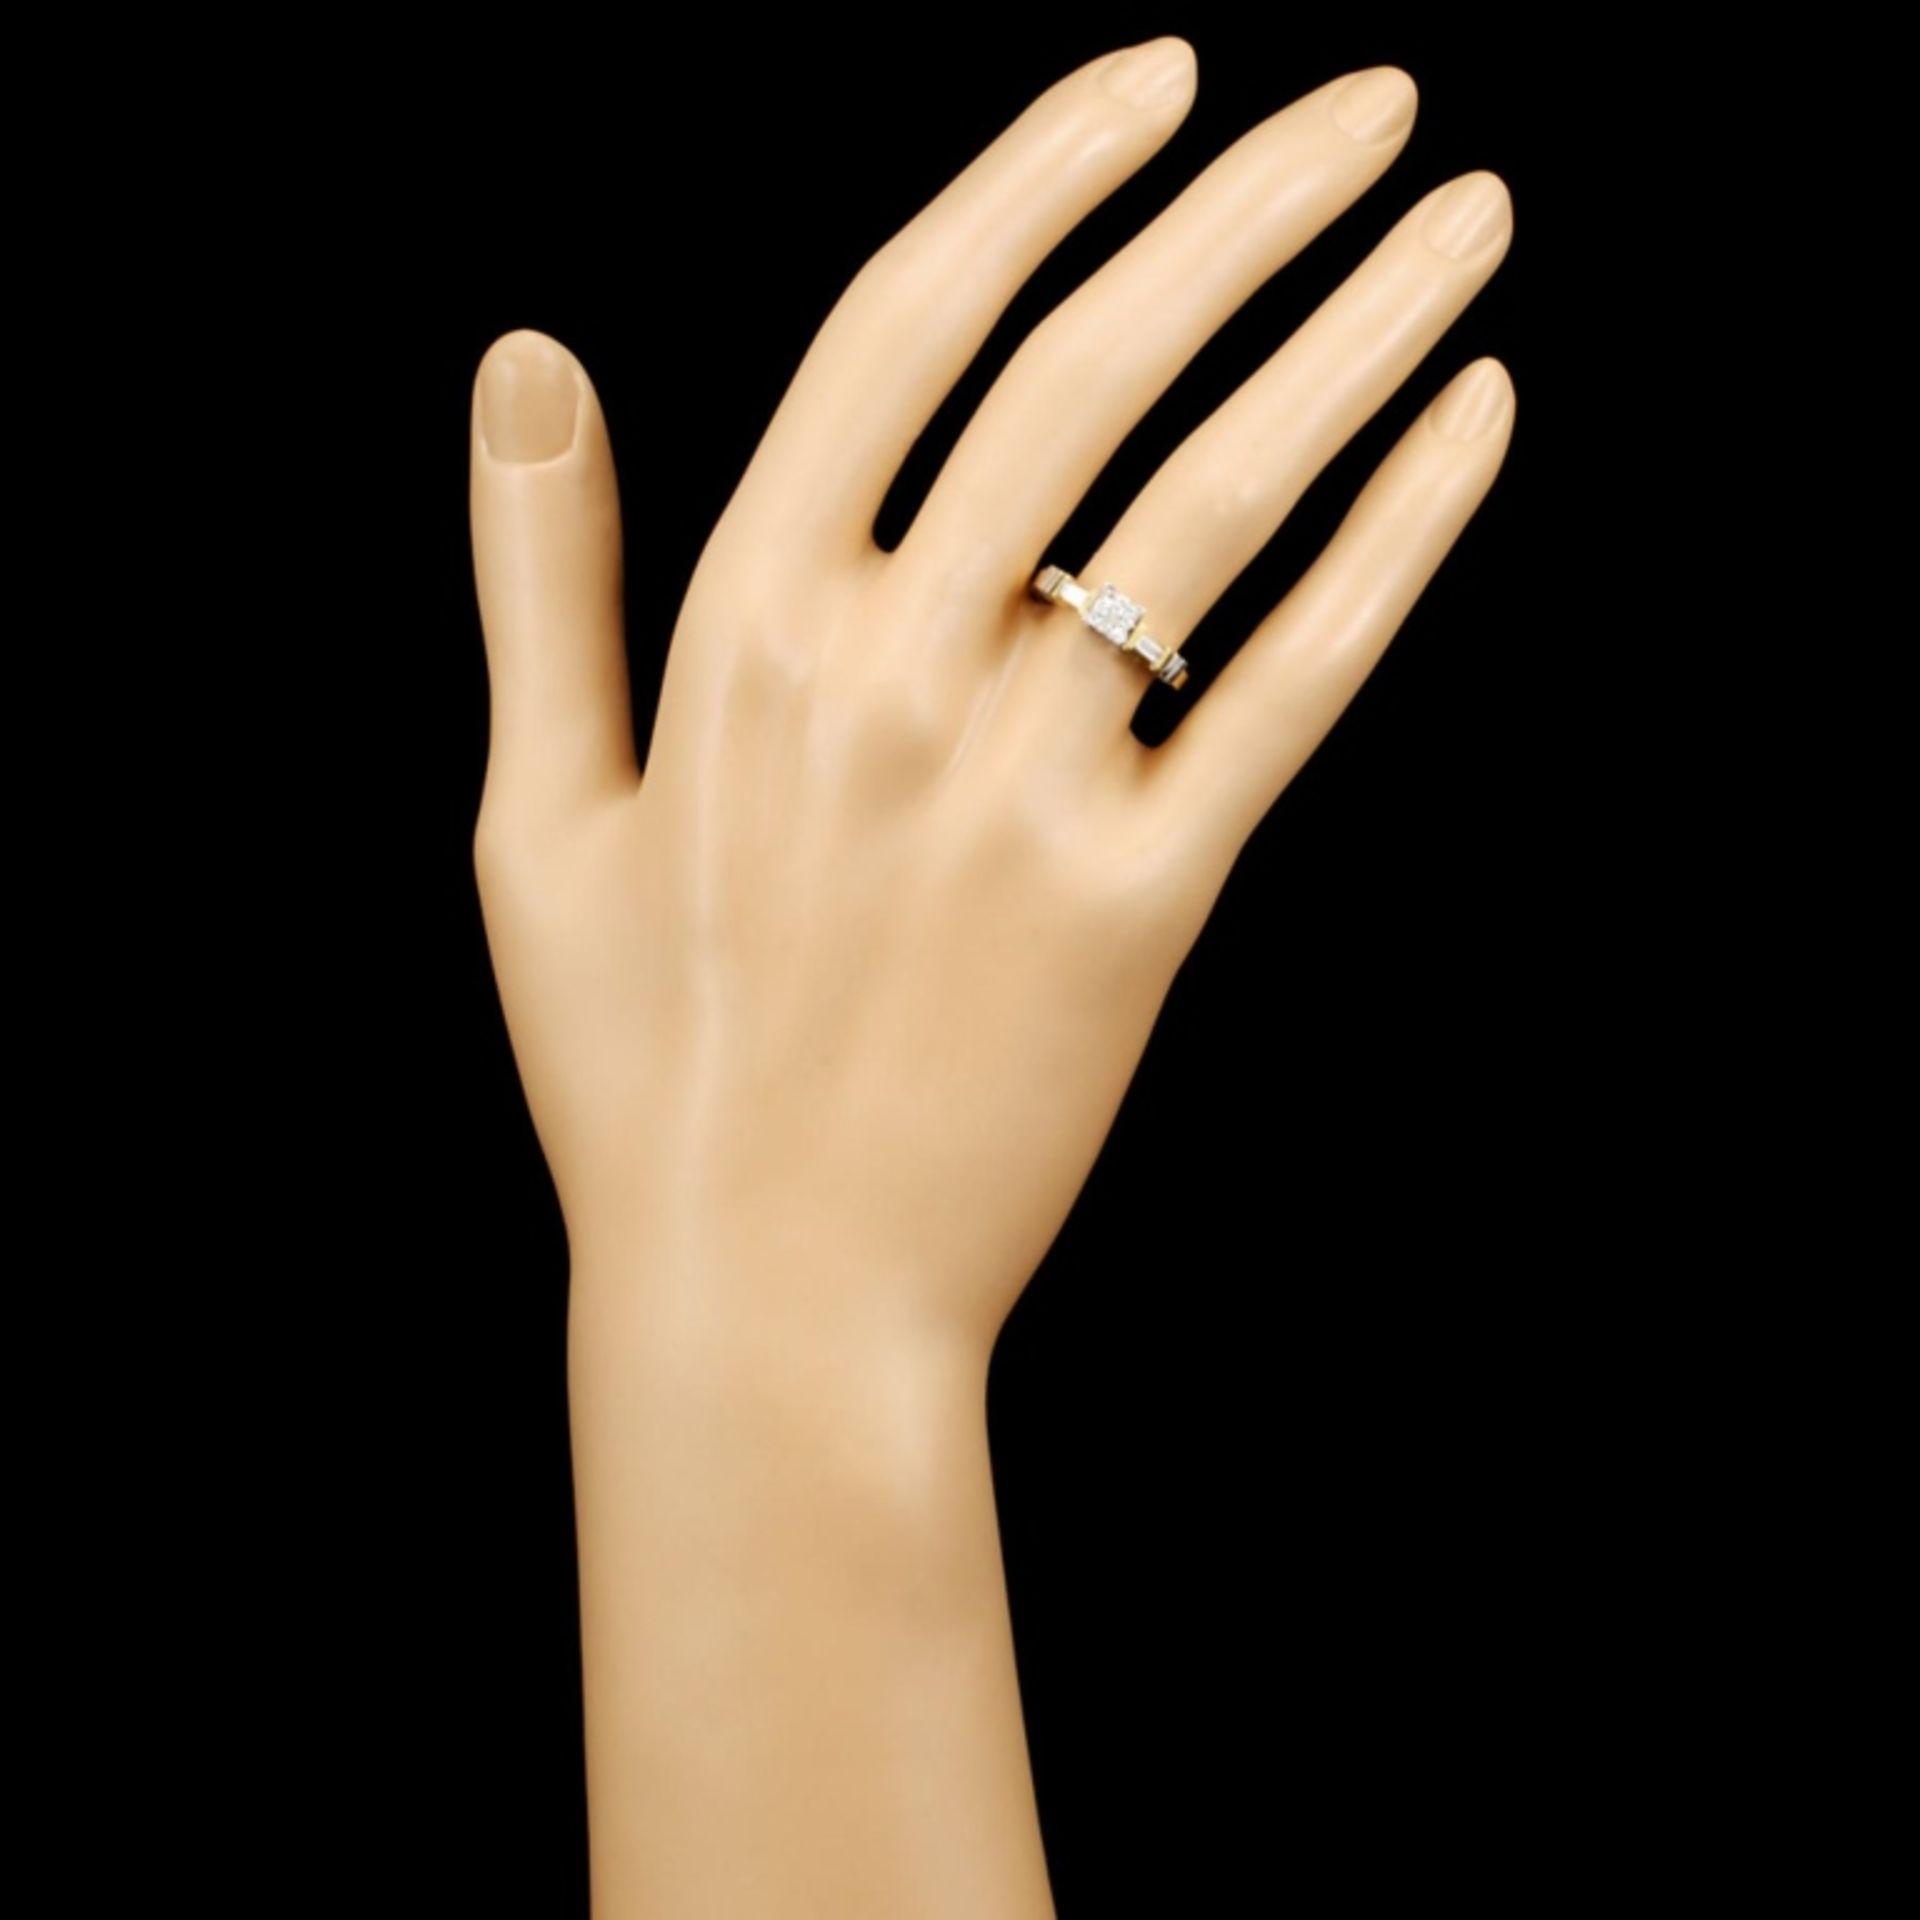 18K Gold 0.50ctw Diamond Ring - Image 4 of 4